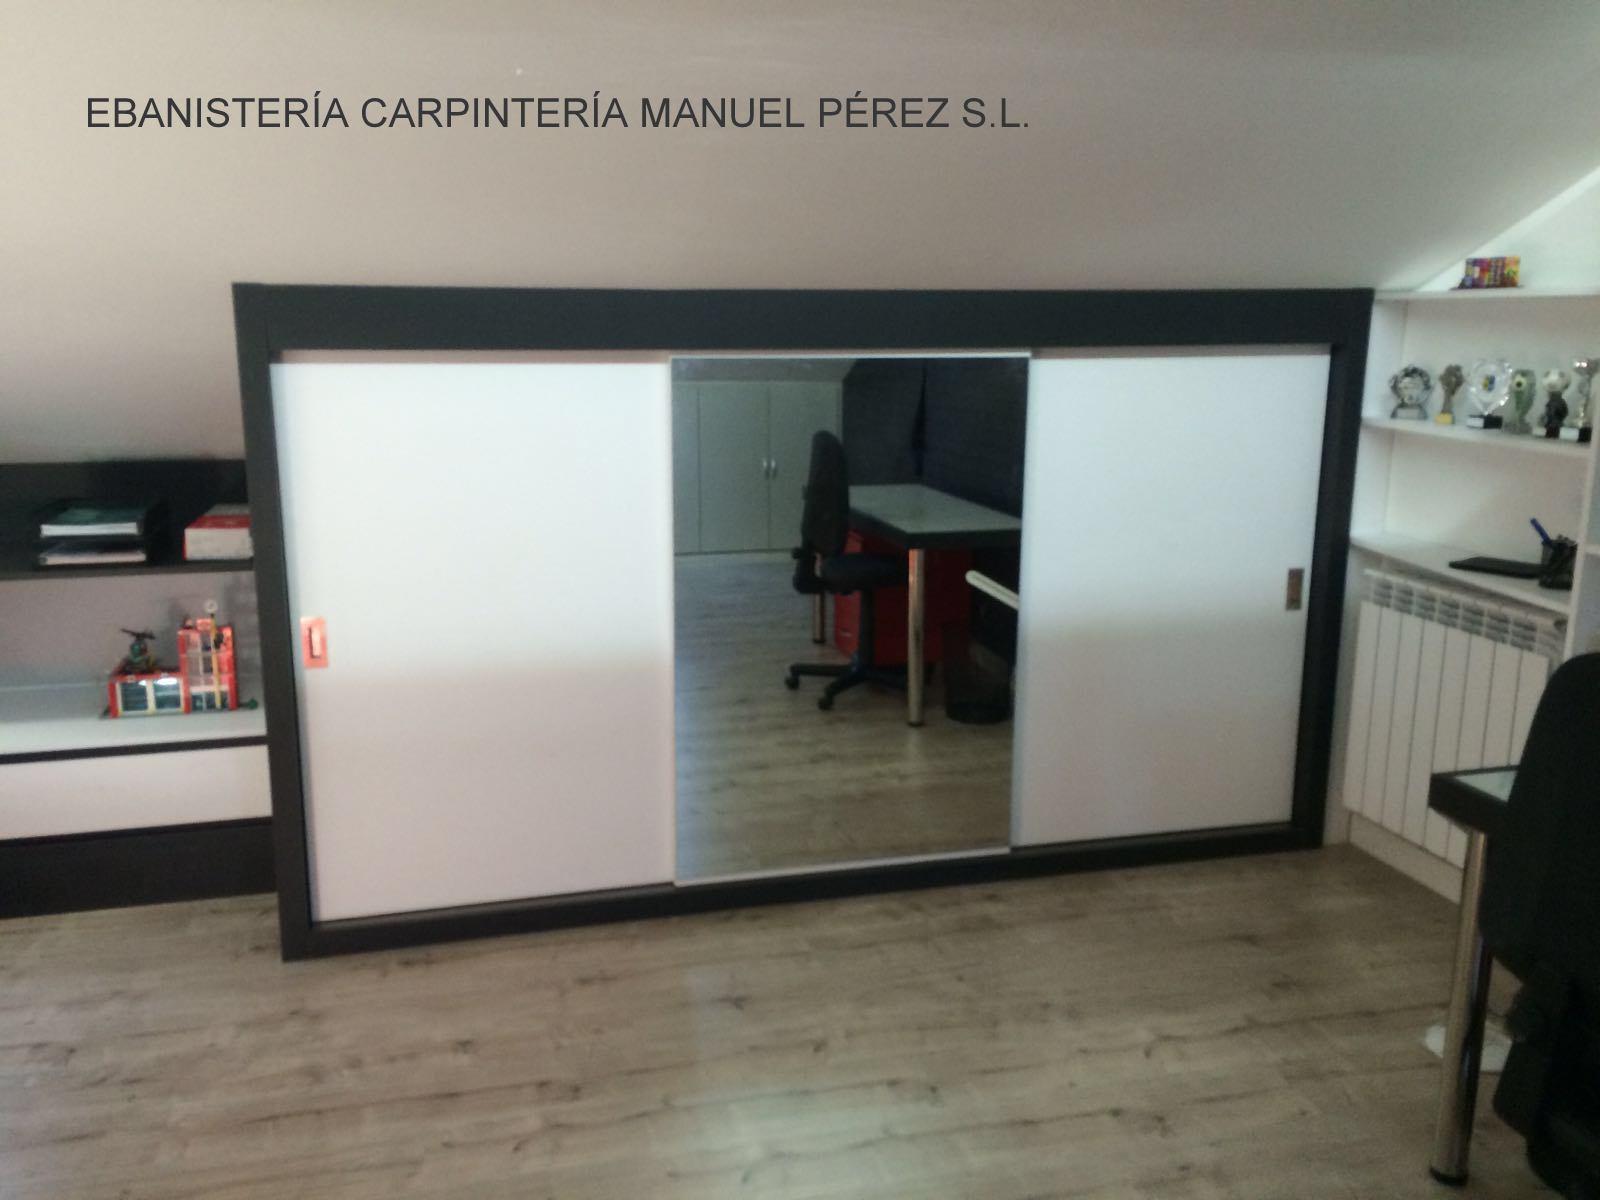 Ebanisteria carpinteria manuel perez zaragoza - Armarios para habitacion ...